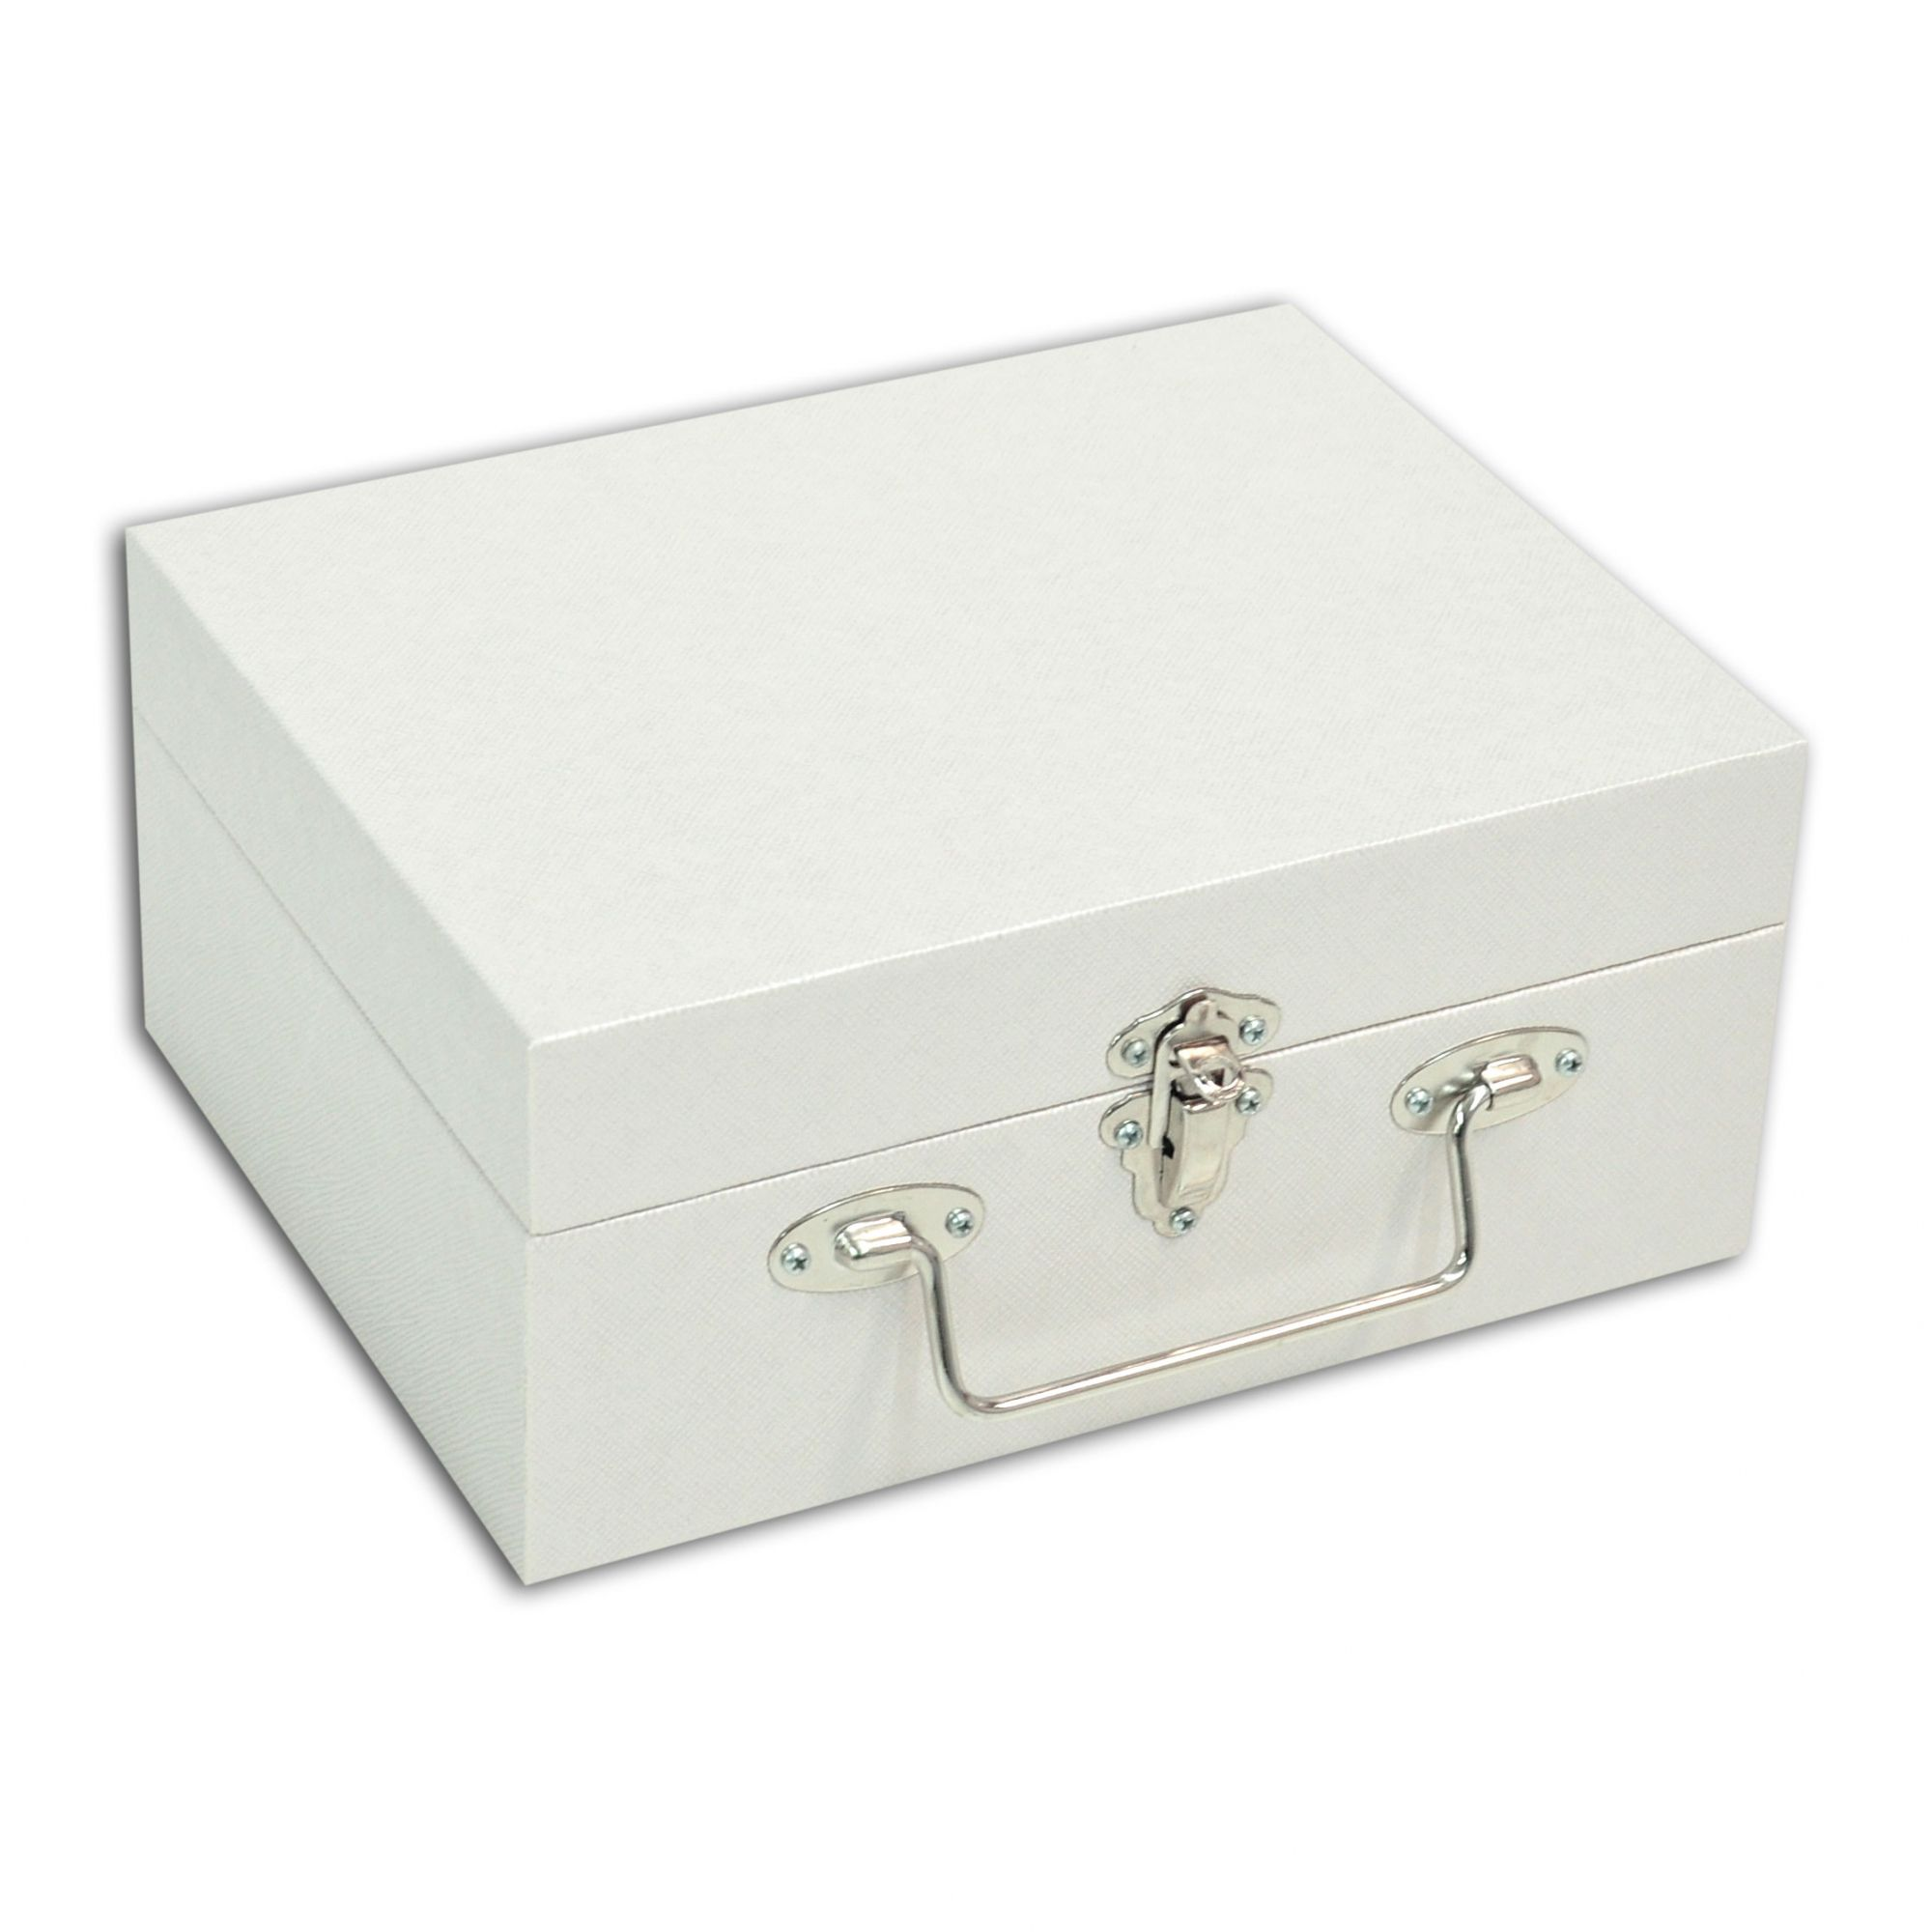 Maleta / Porta Joias Pequeno Duplo - Perolizado / Cinza